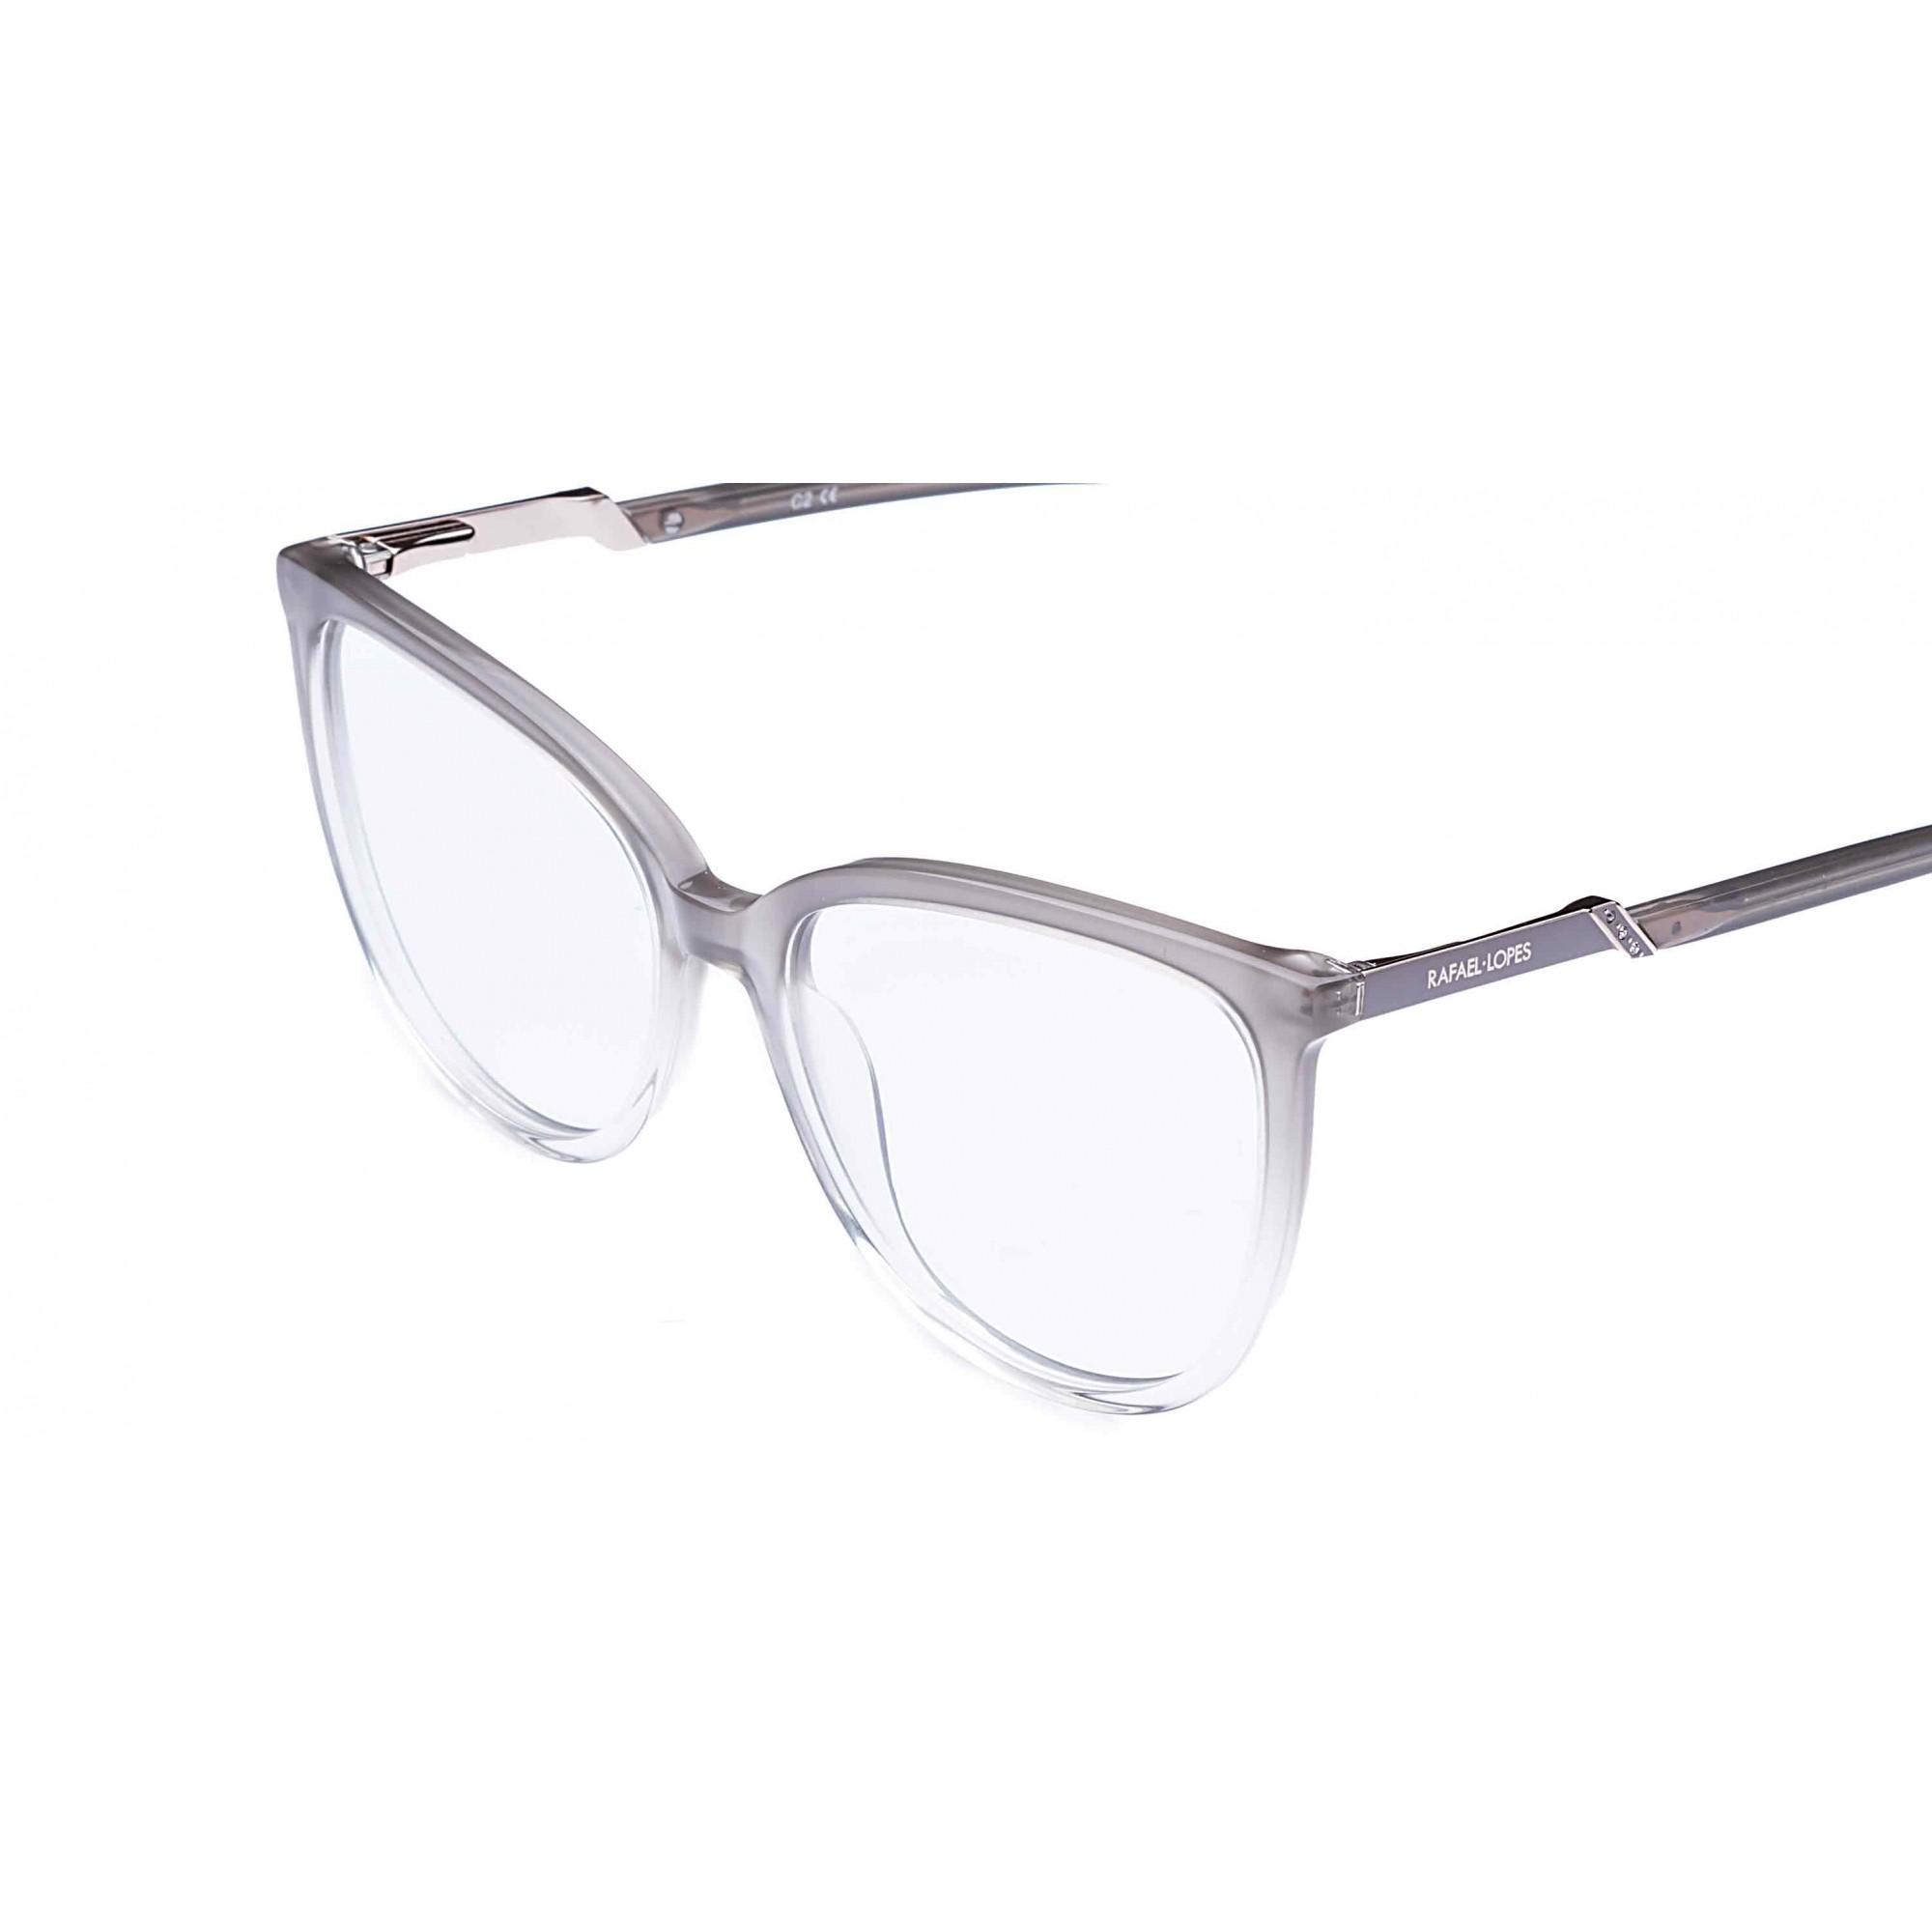 Cherry - Rafael Lopes Eyewear